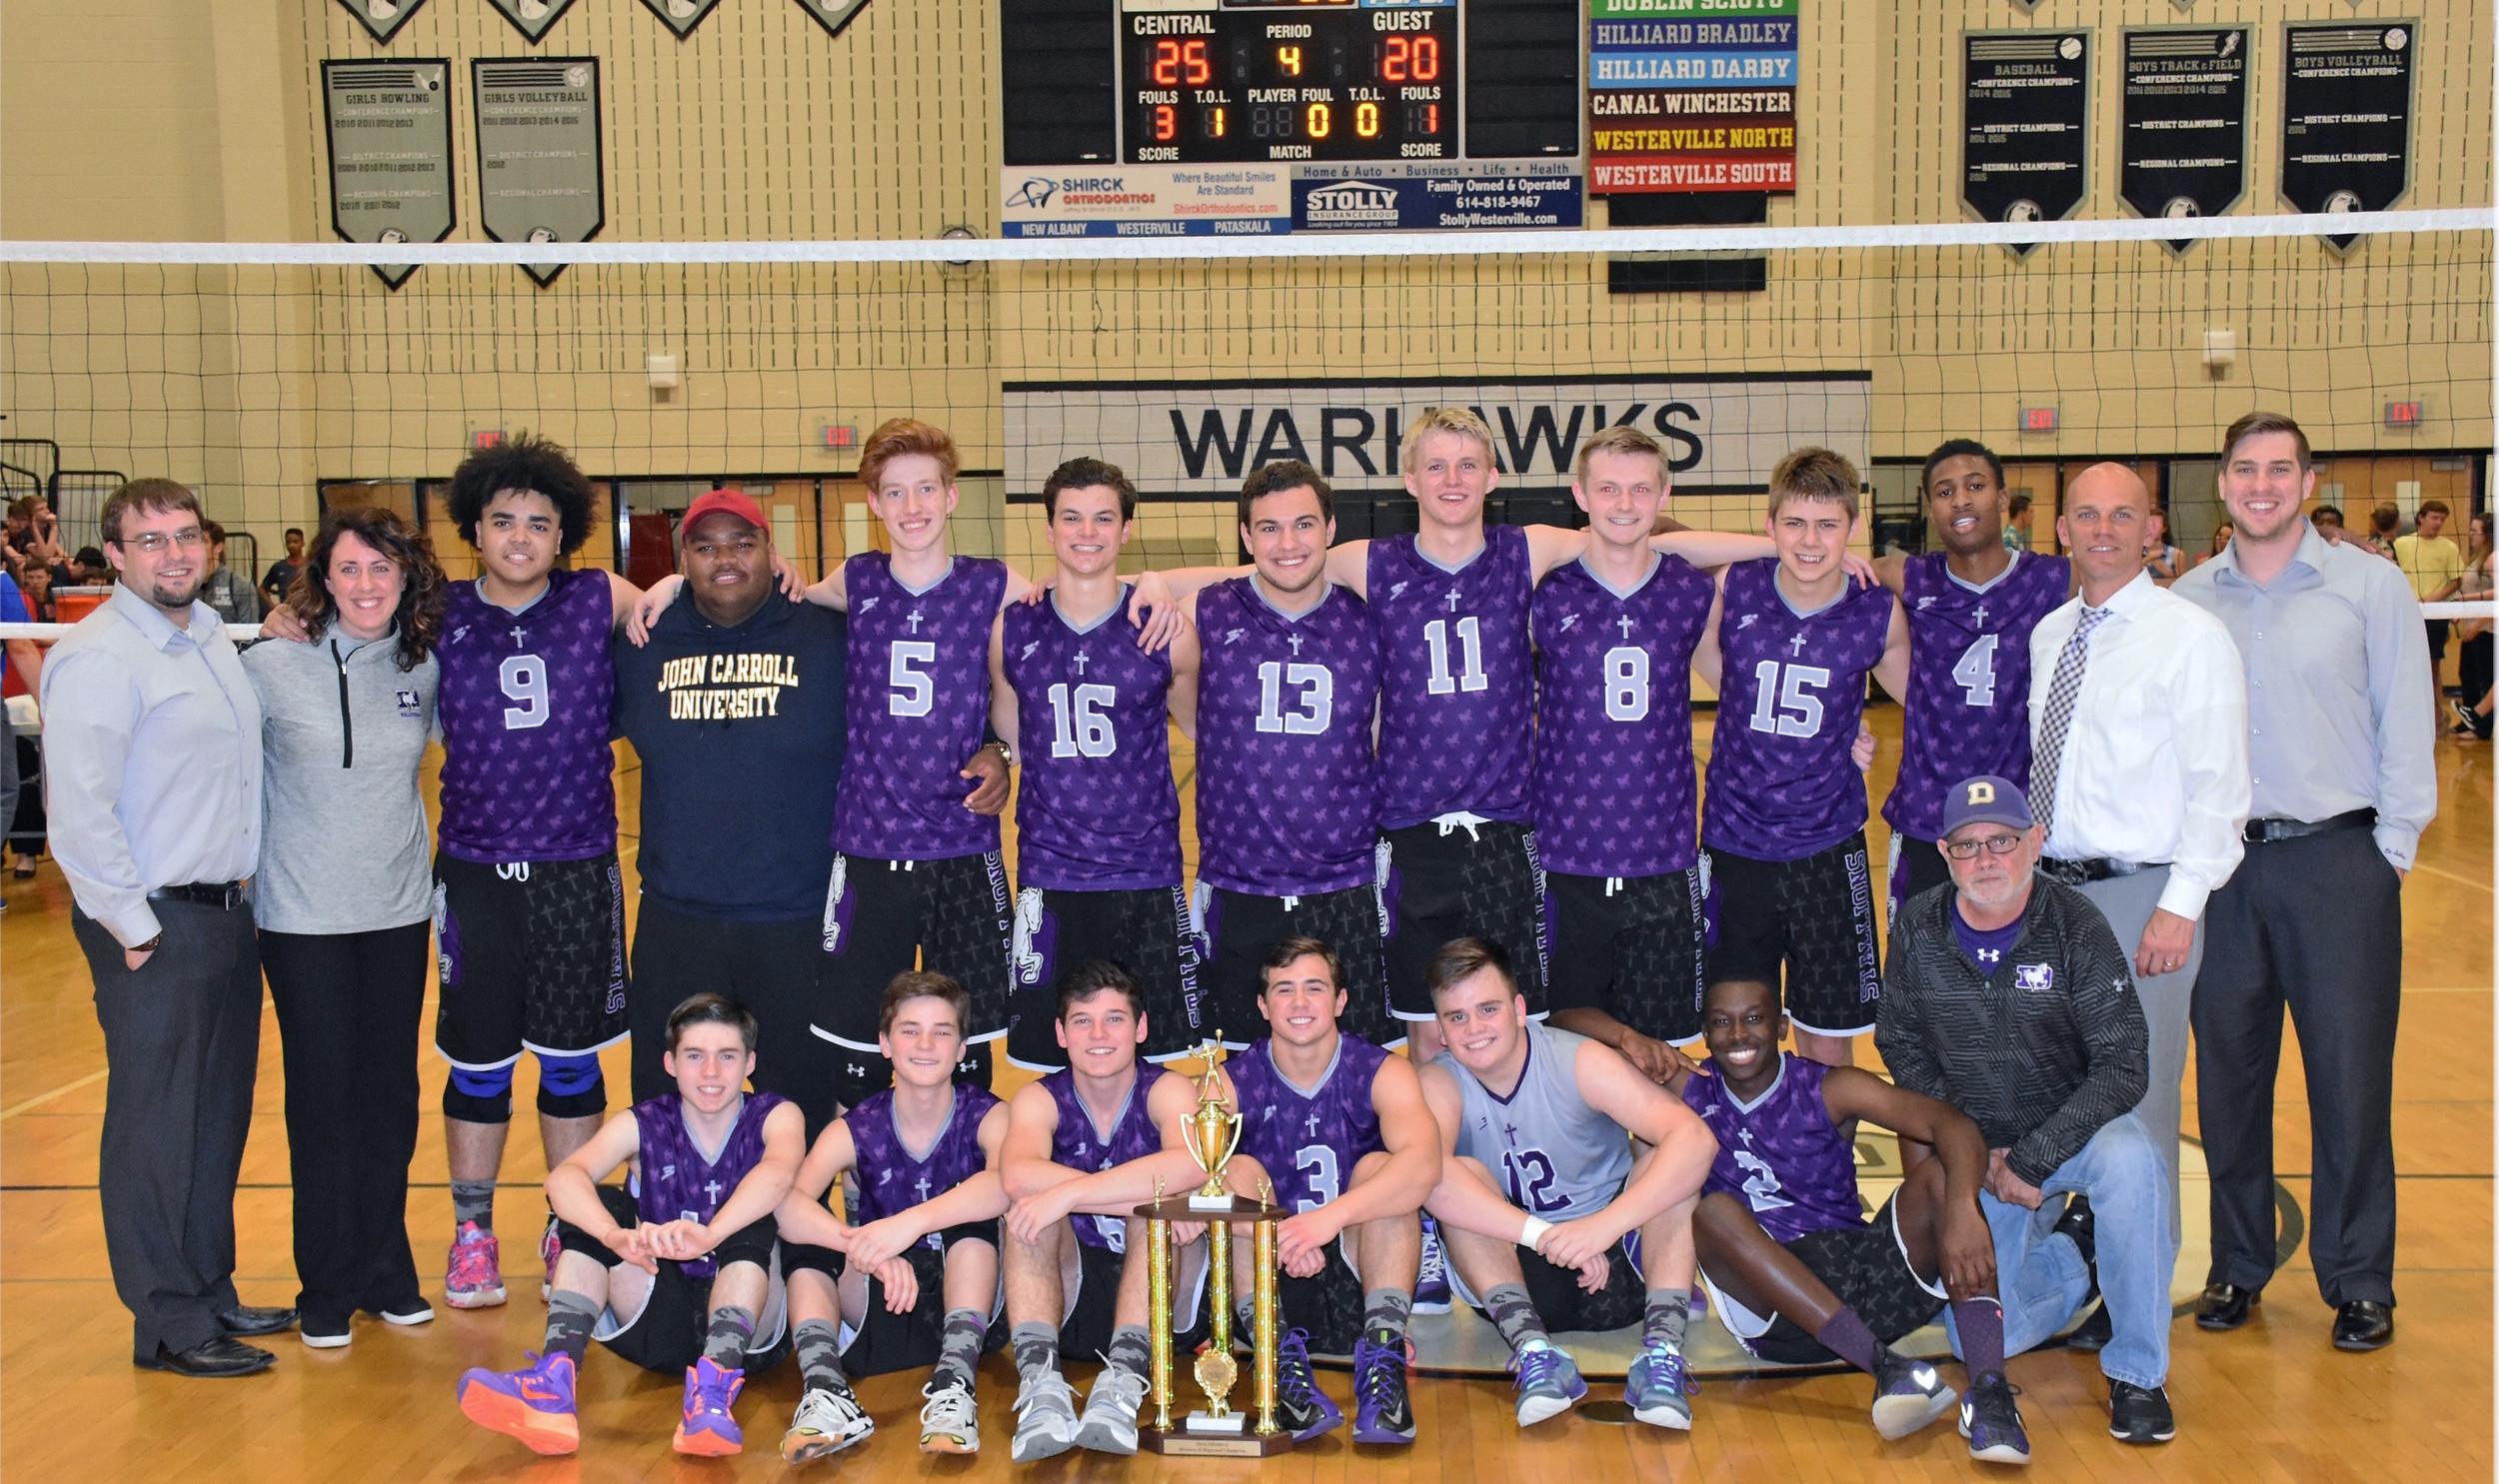 2016 Regional Champions